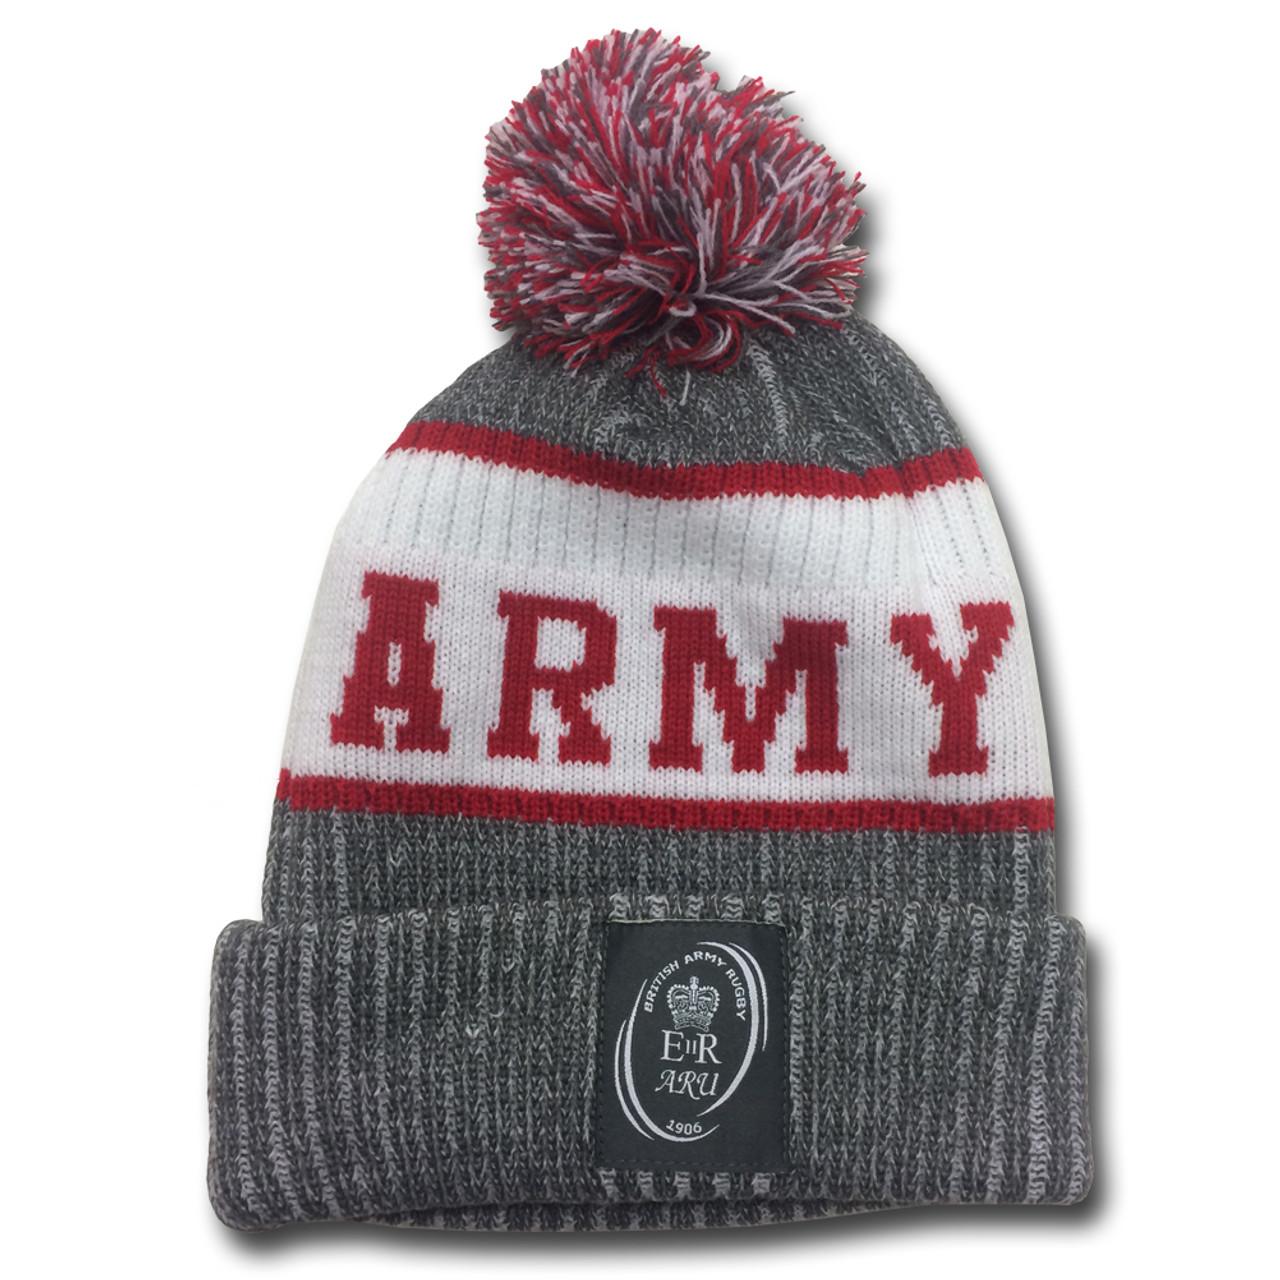 2da4fe97 SAMURAI ARU knitted bobble beanie [grey/white/red]